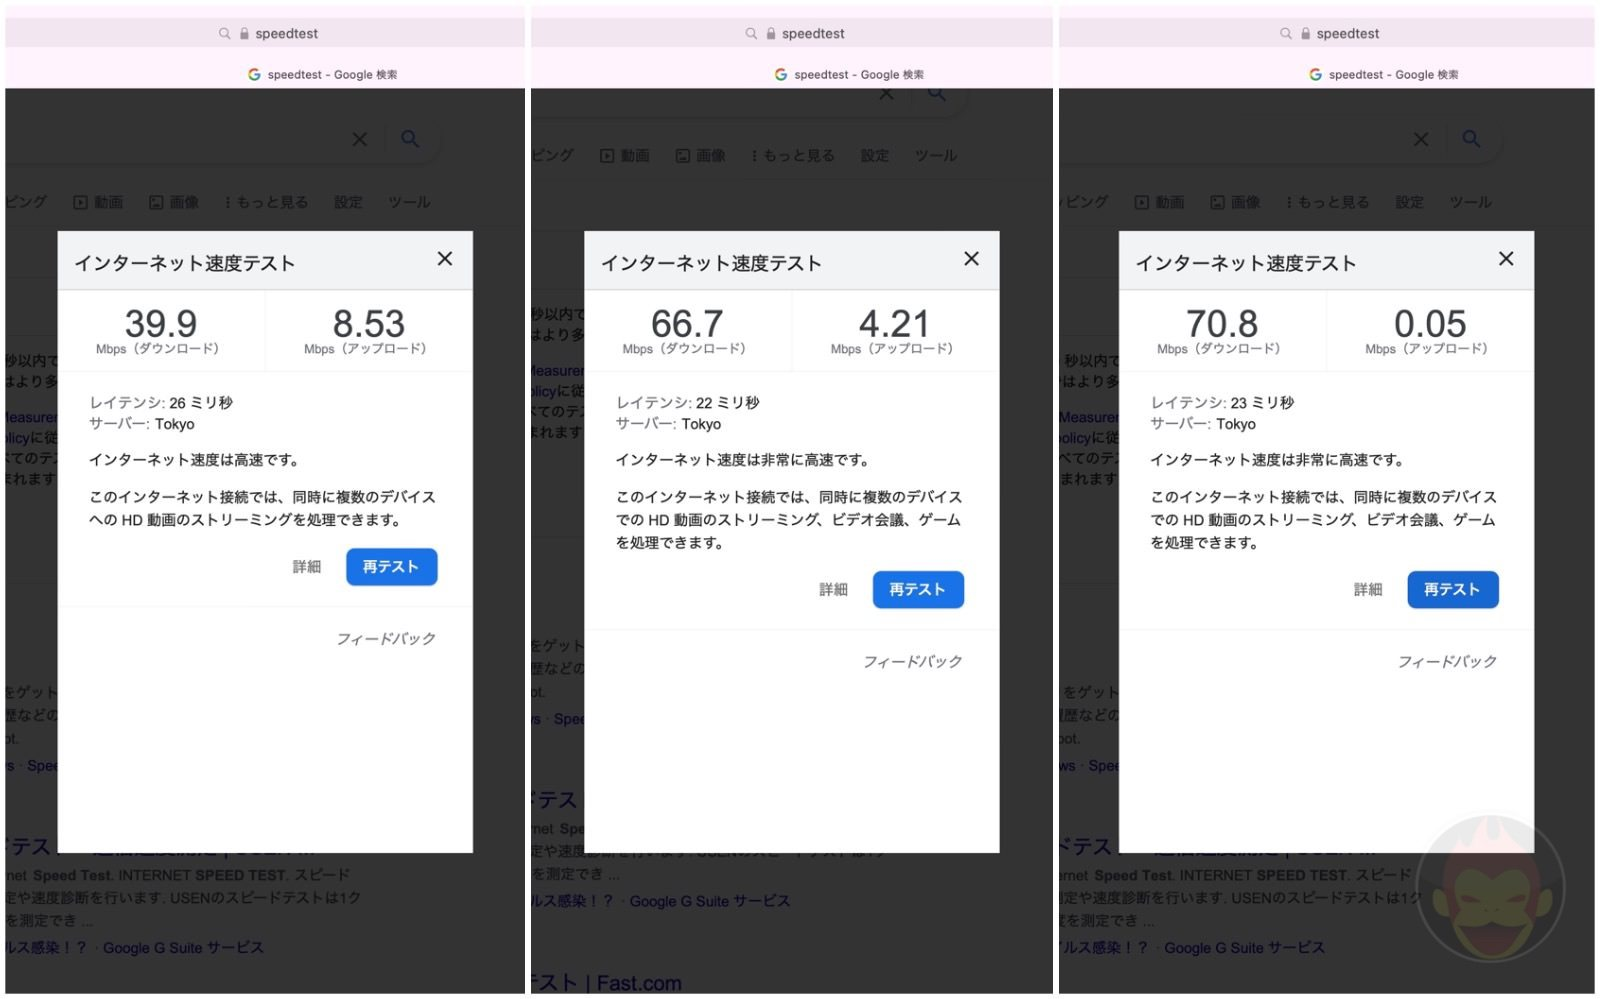 iphone12pro-tethering-tethered-speedtest.jpg